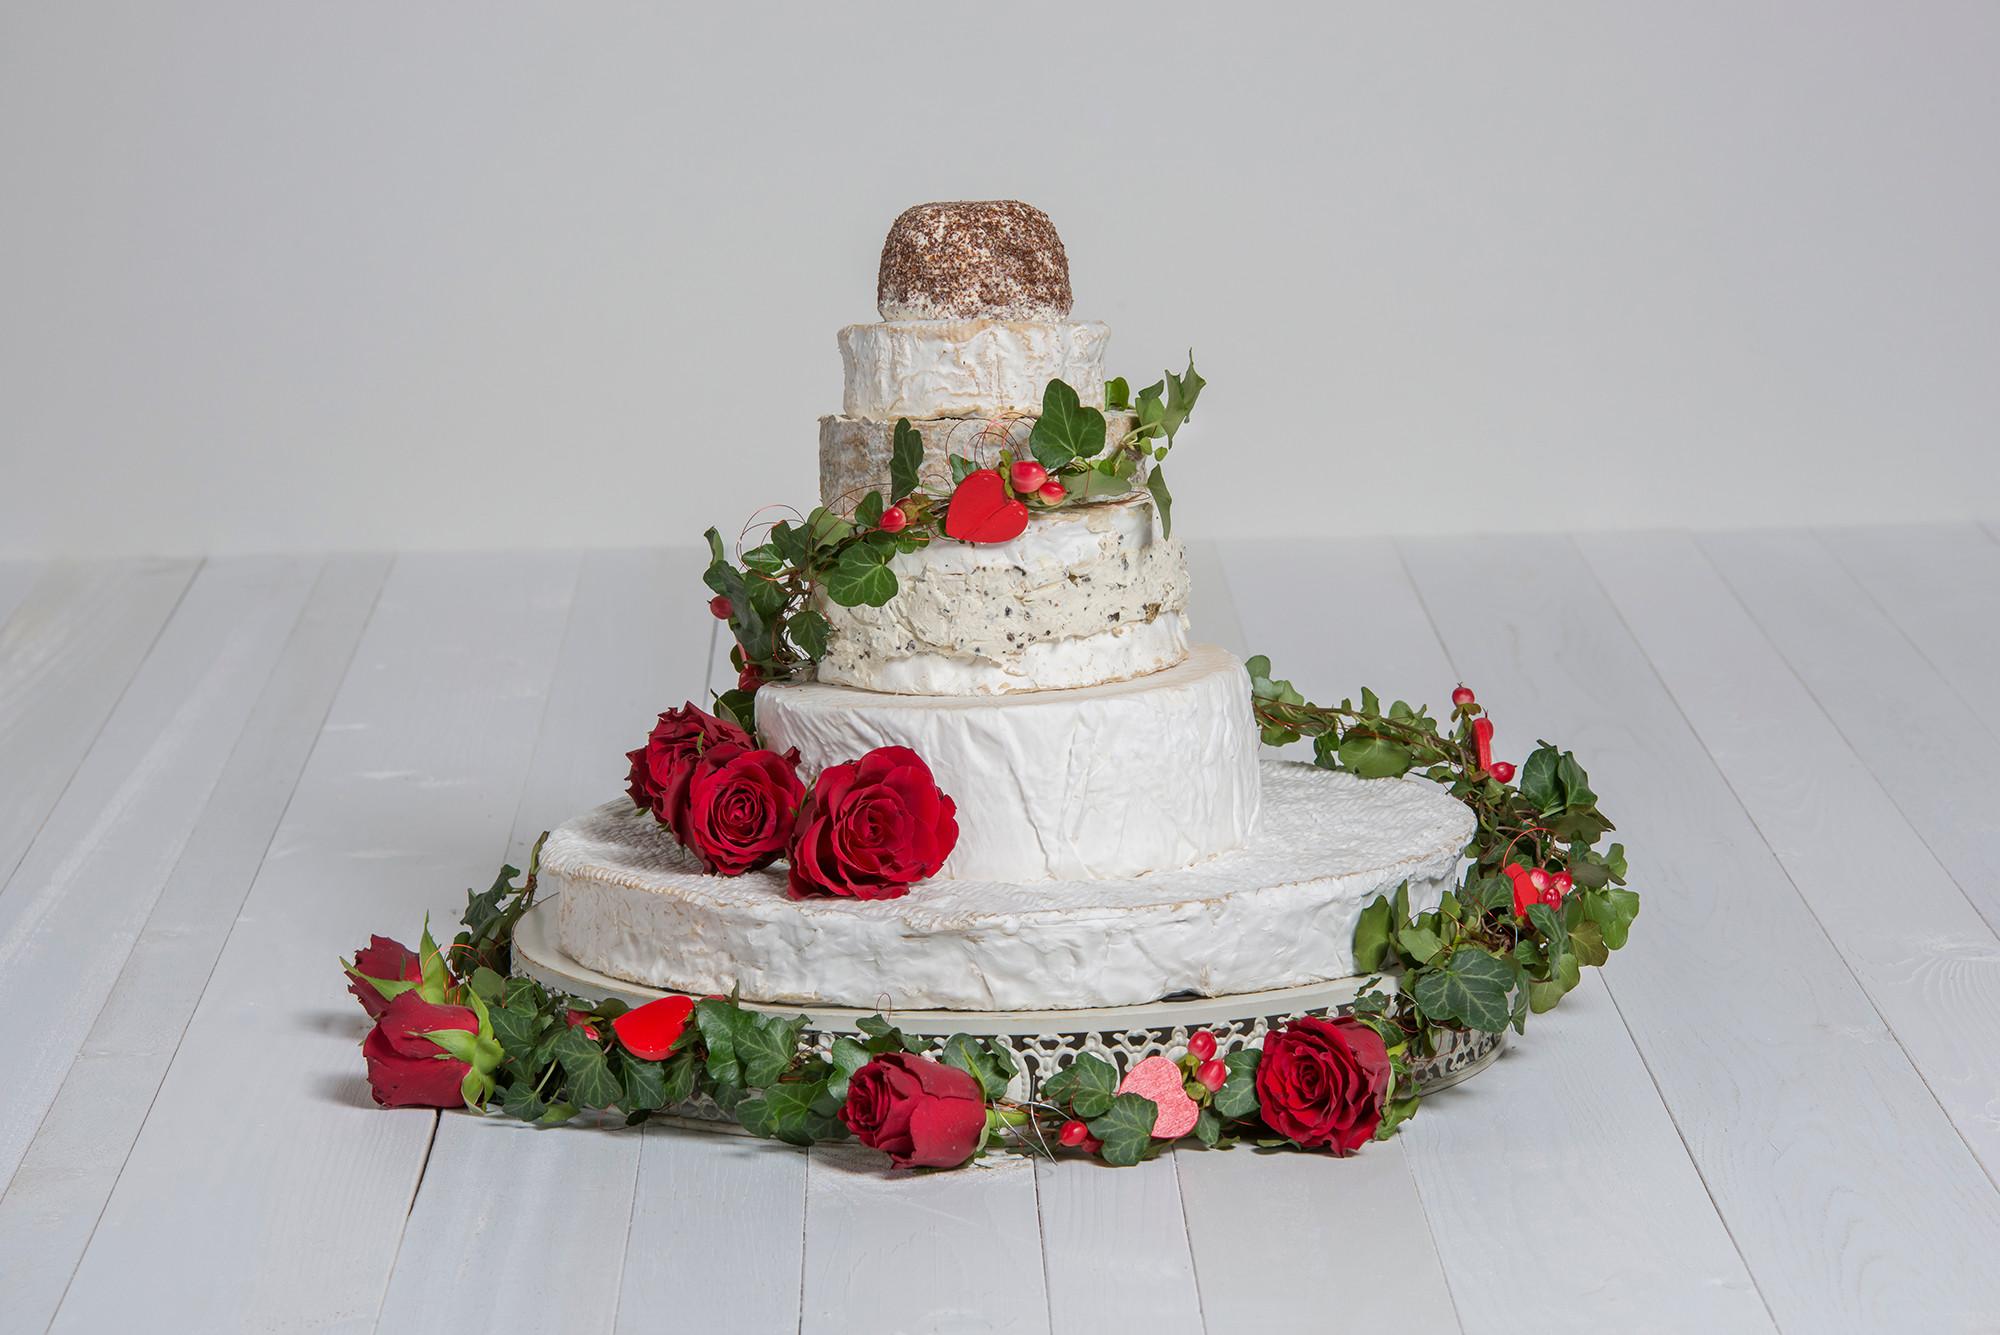 Käse-Hochzeitstorte 'Sophia' Probierpaket